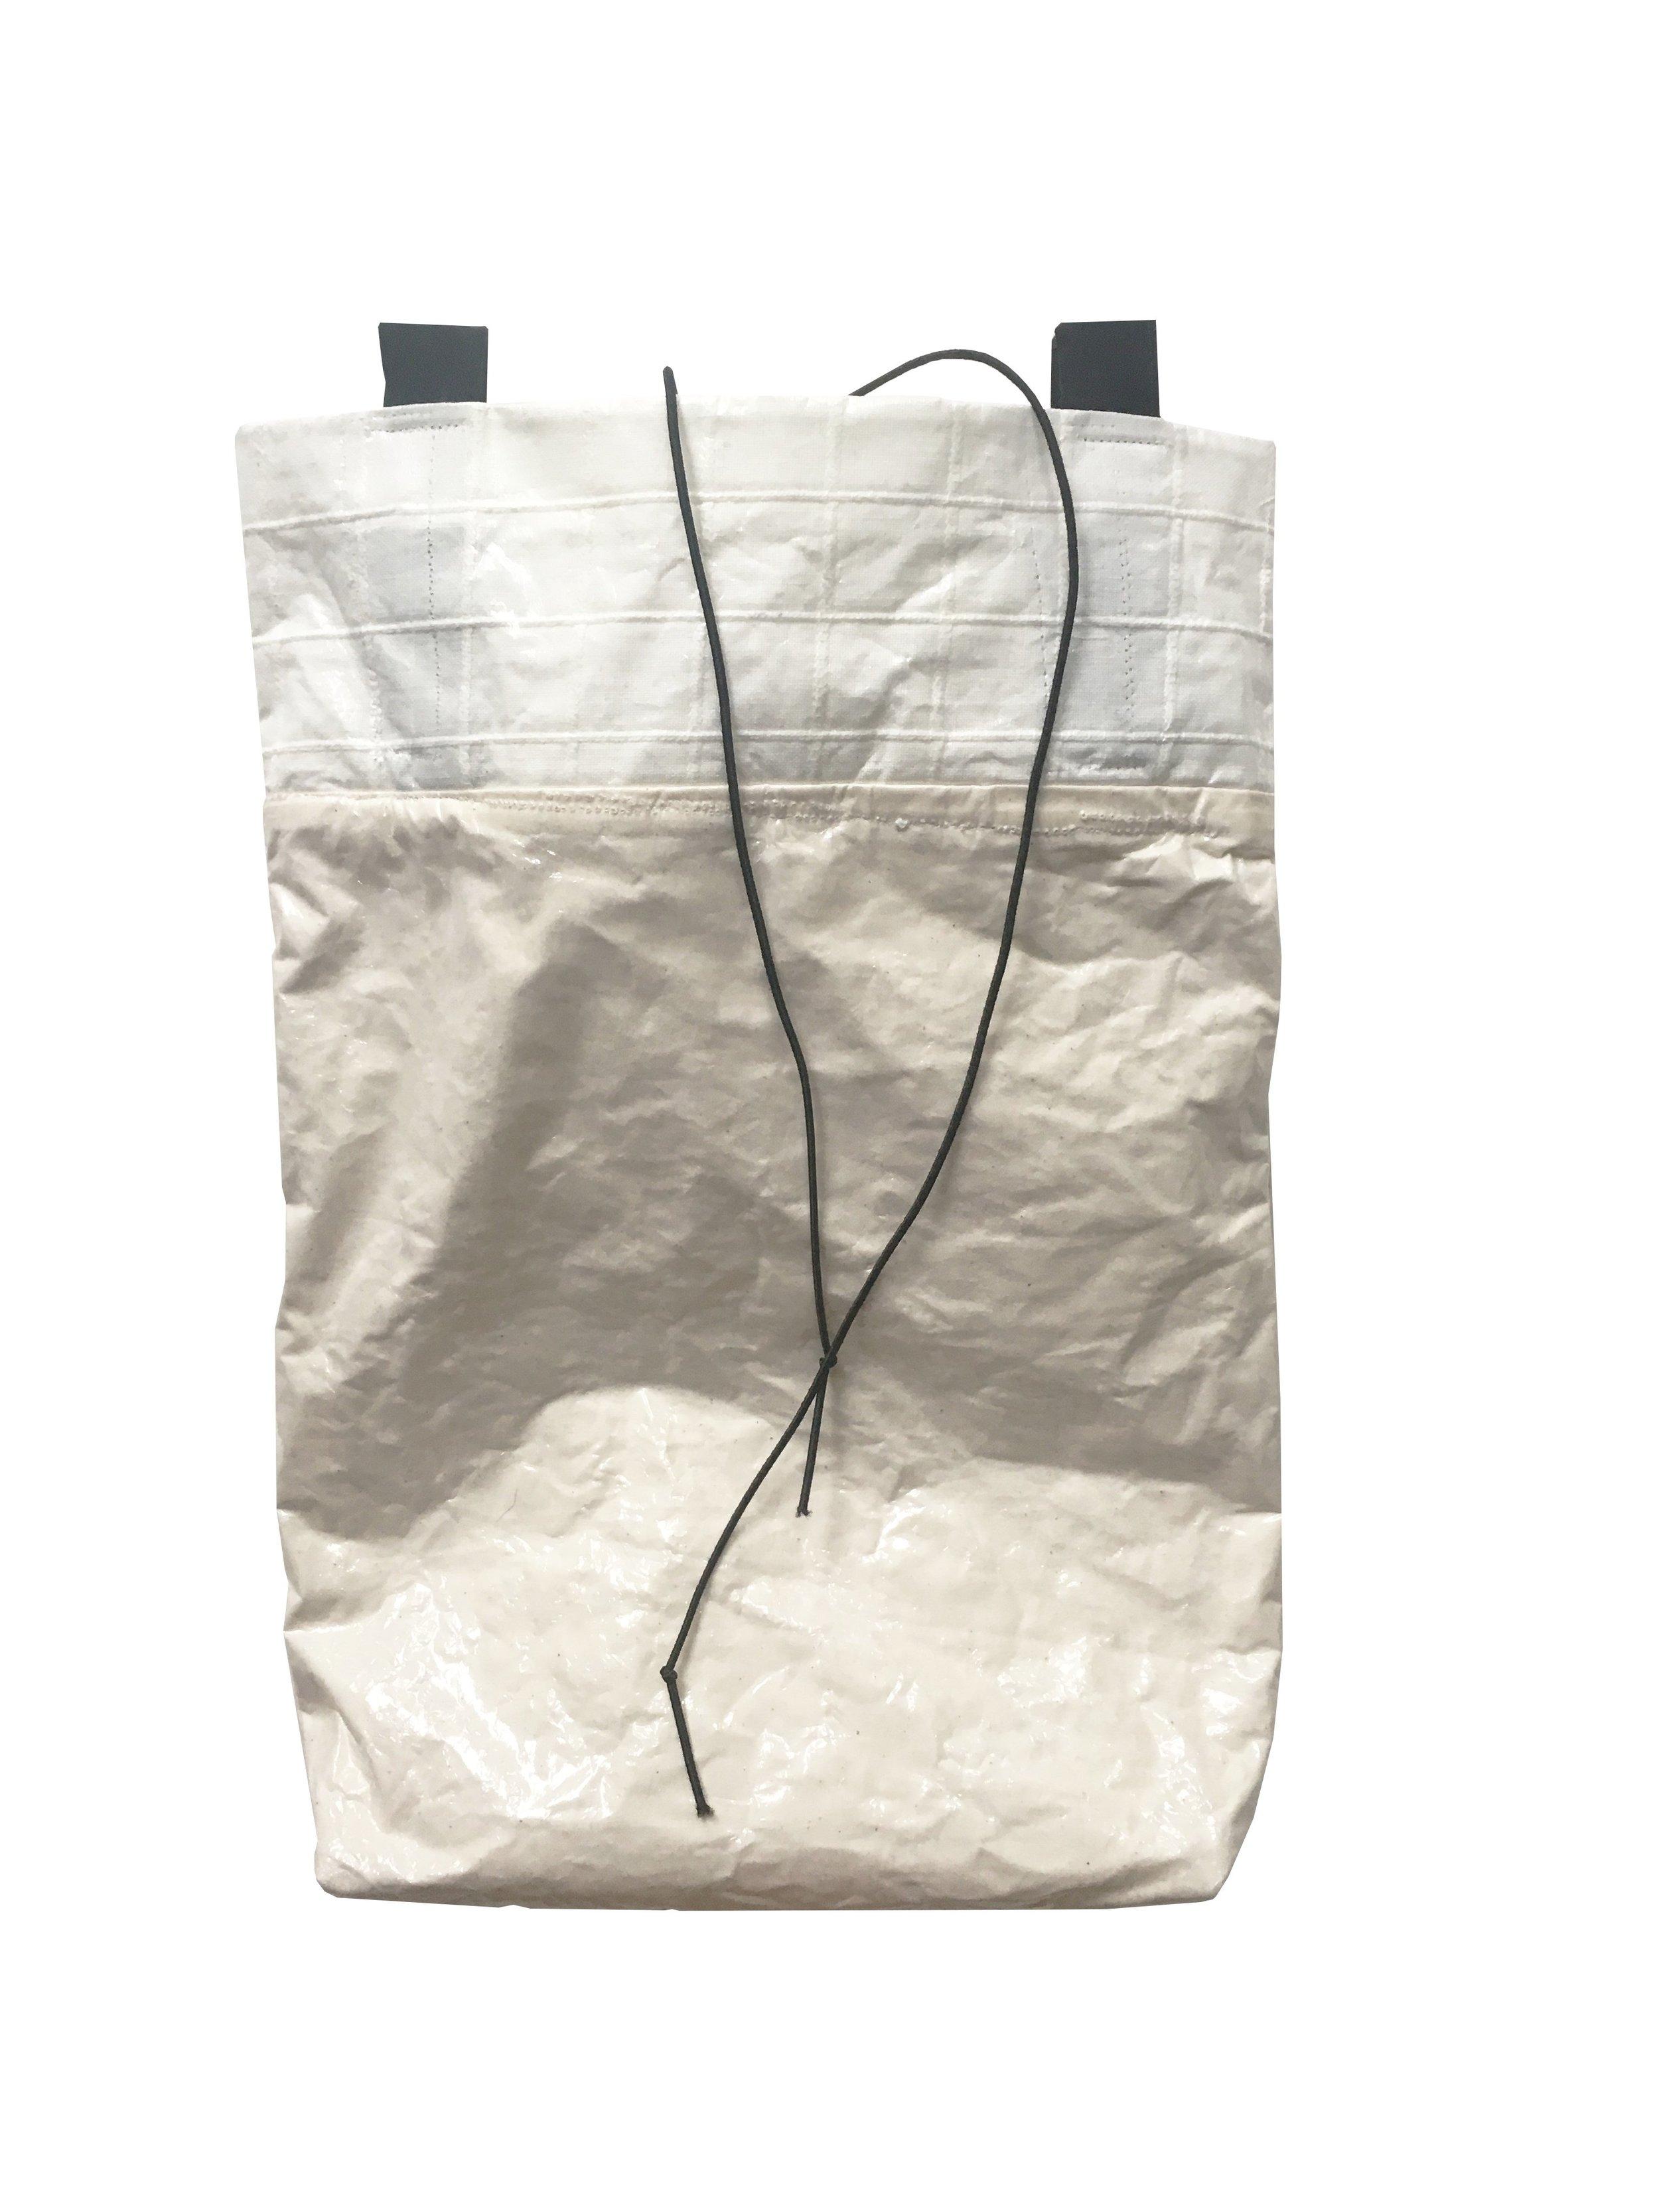 Backpack11.jpg